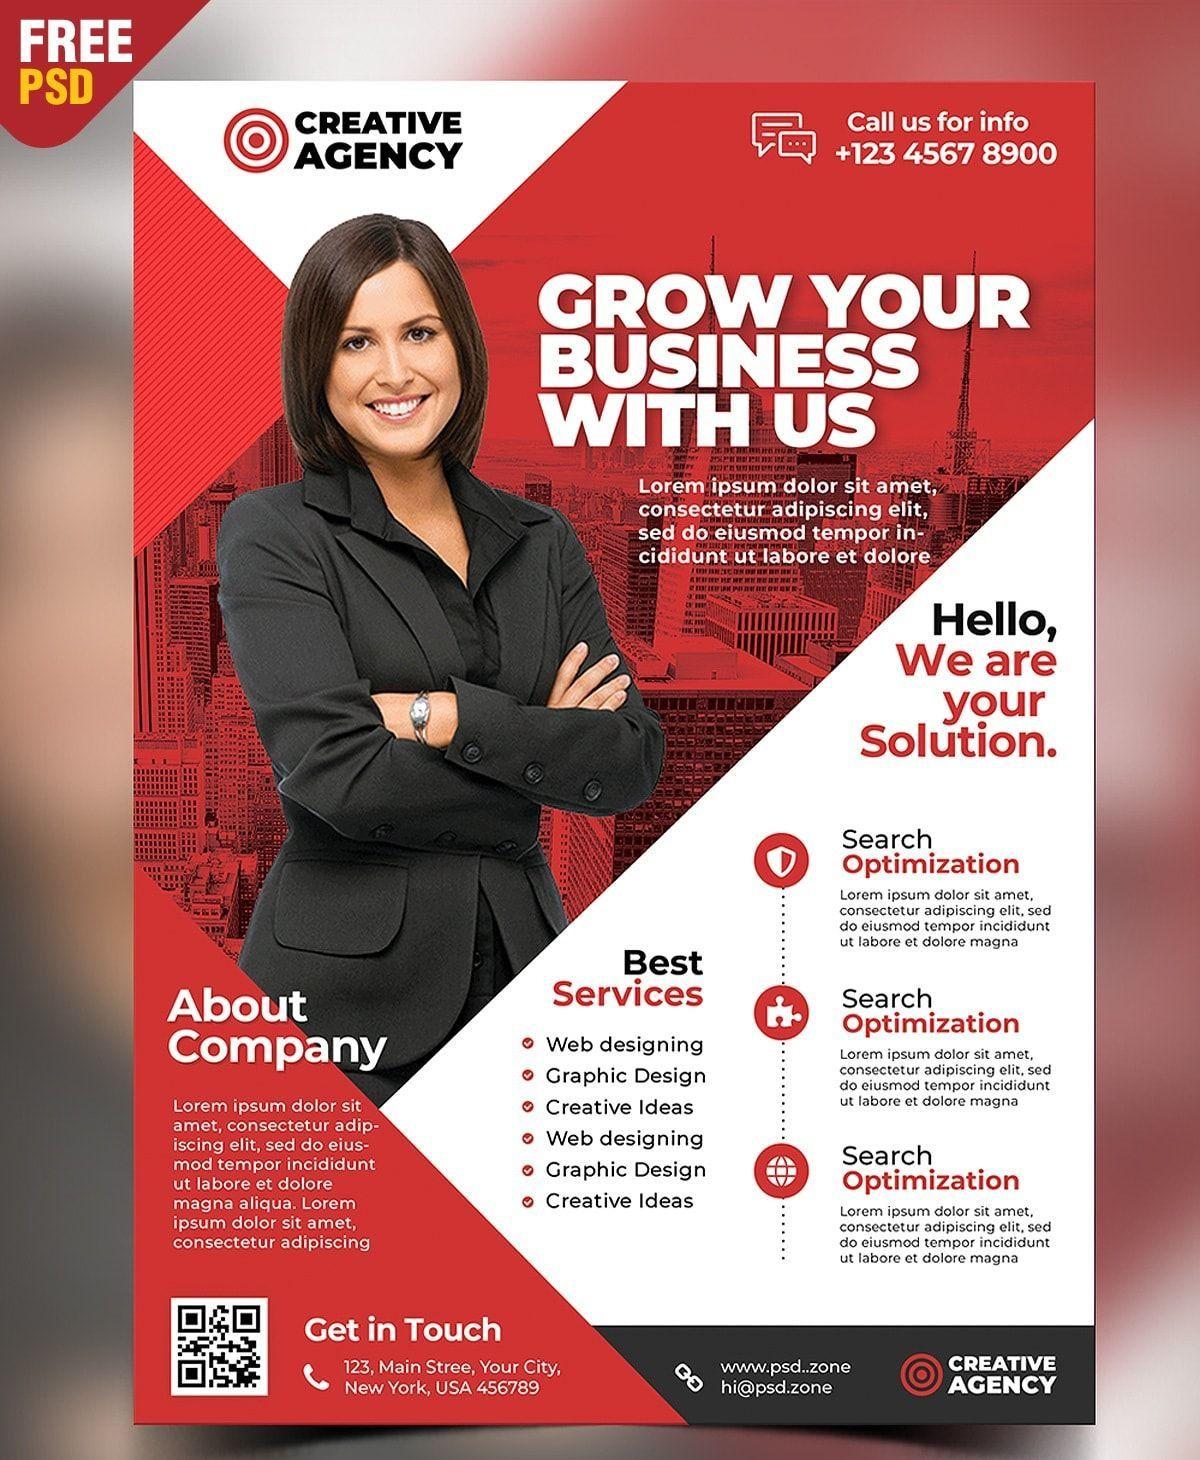 002 Unique Free Psd Busines Brochure Template Concept  Templates Flyer 2018 CorporateFull